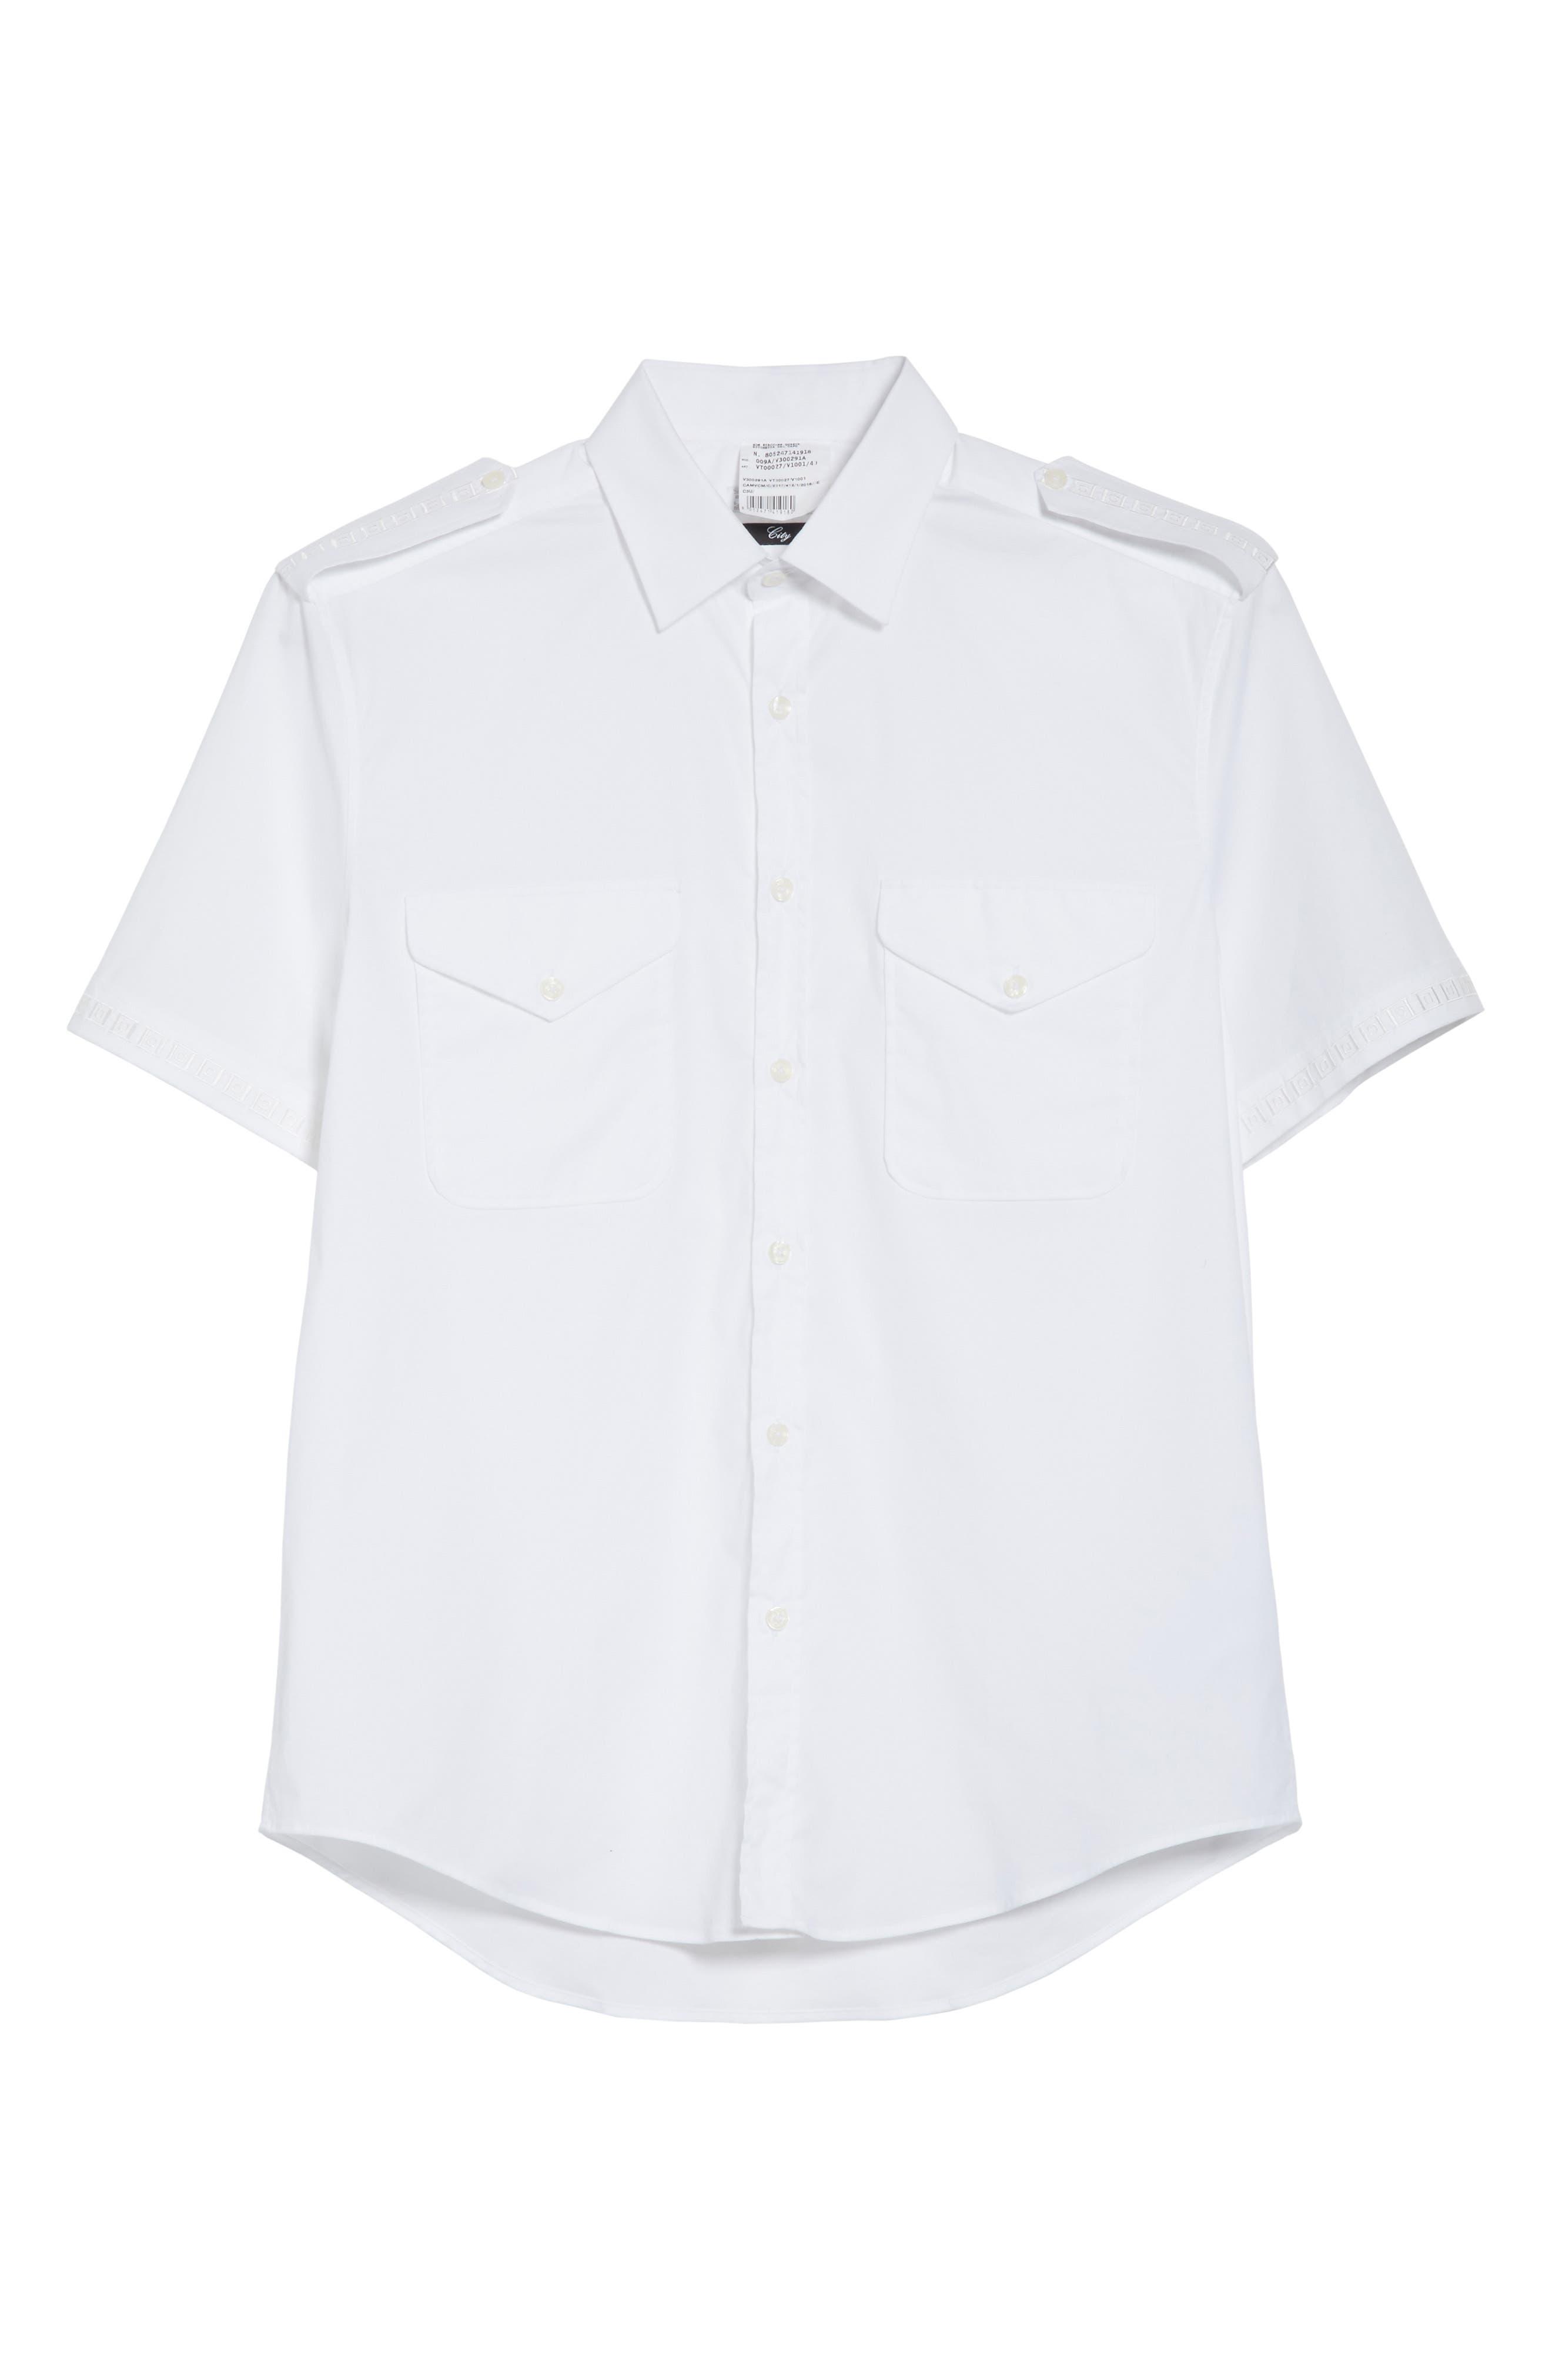 Short Sleeve Military Shirt,                             Alternate thumbnail 6, color,                             100